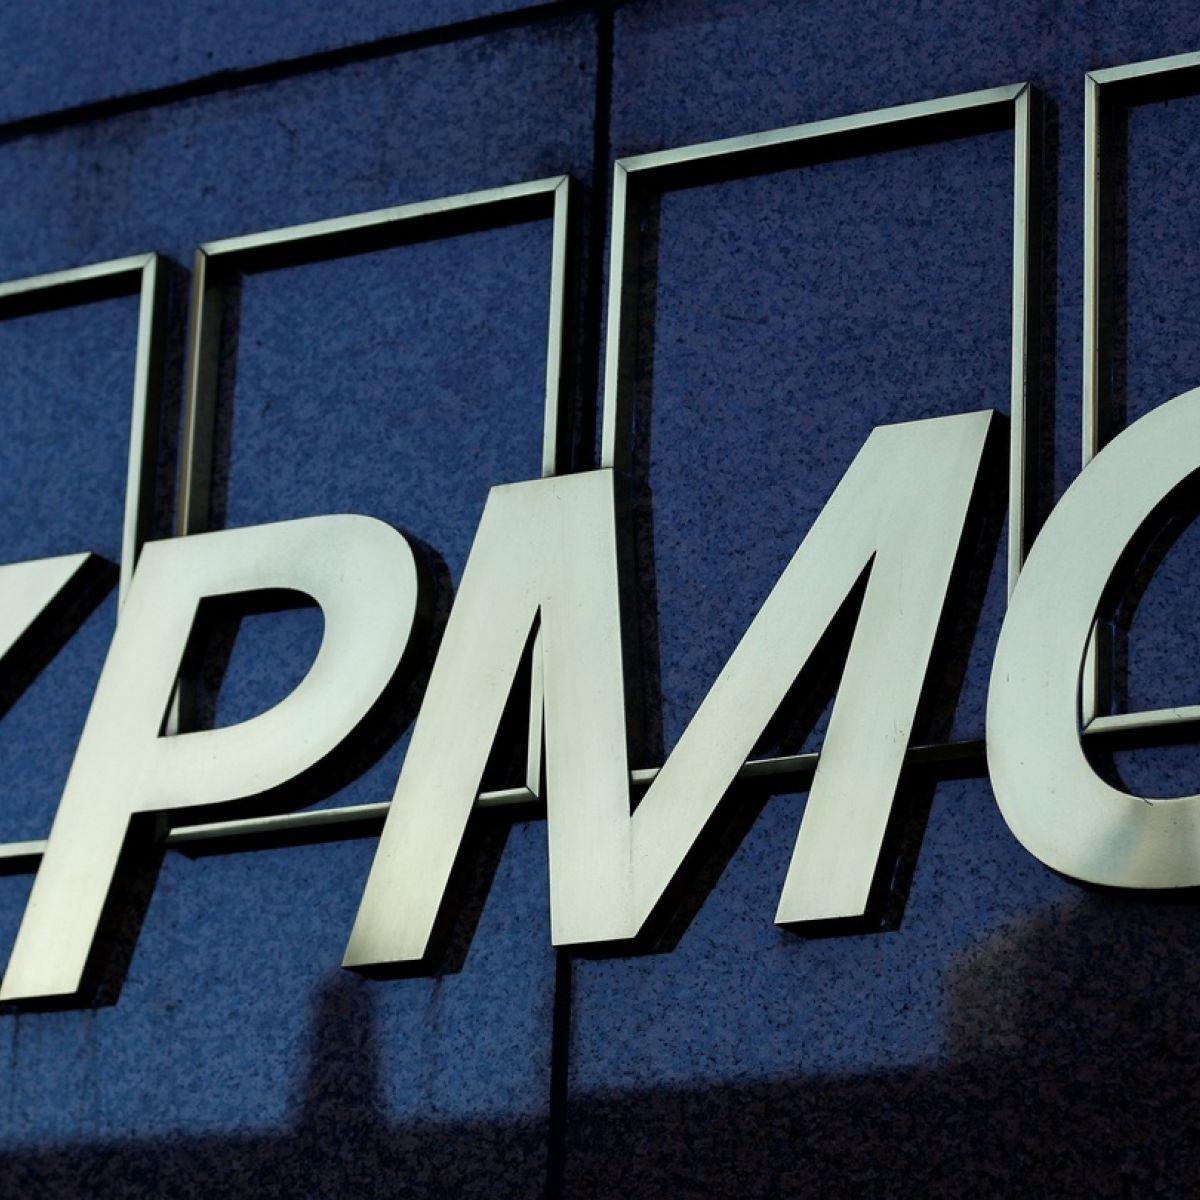 KPMG to pay $50m fine for using stolen watchdog data